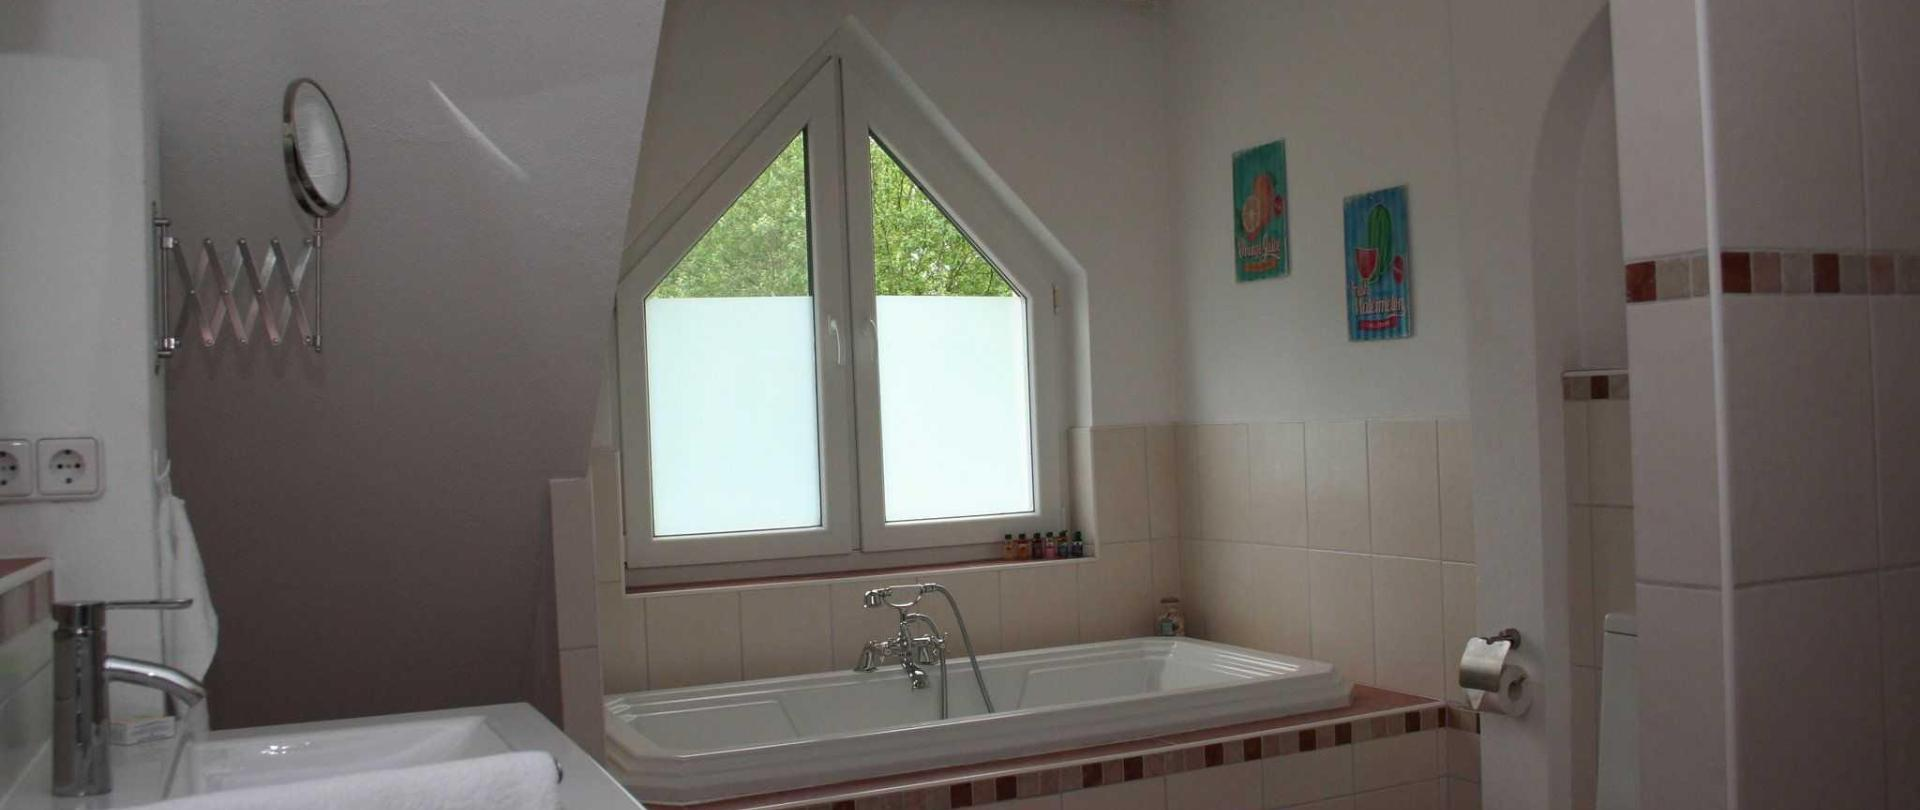 badkamer-3b.jpg